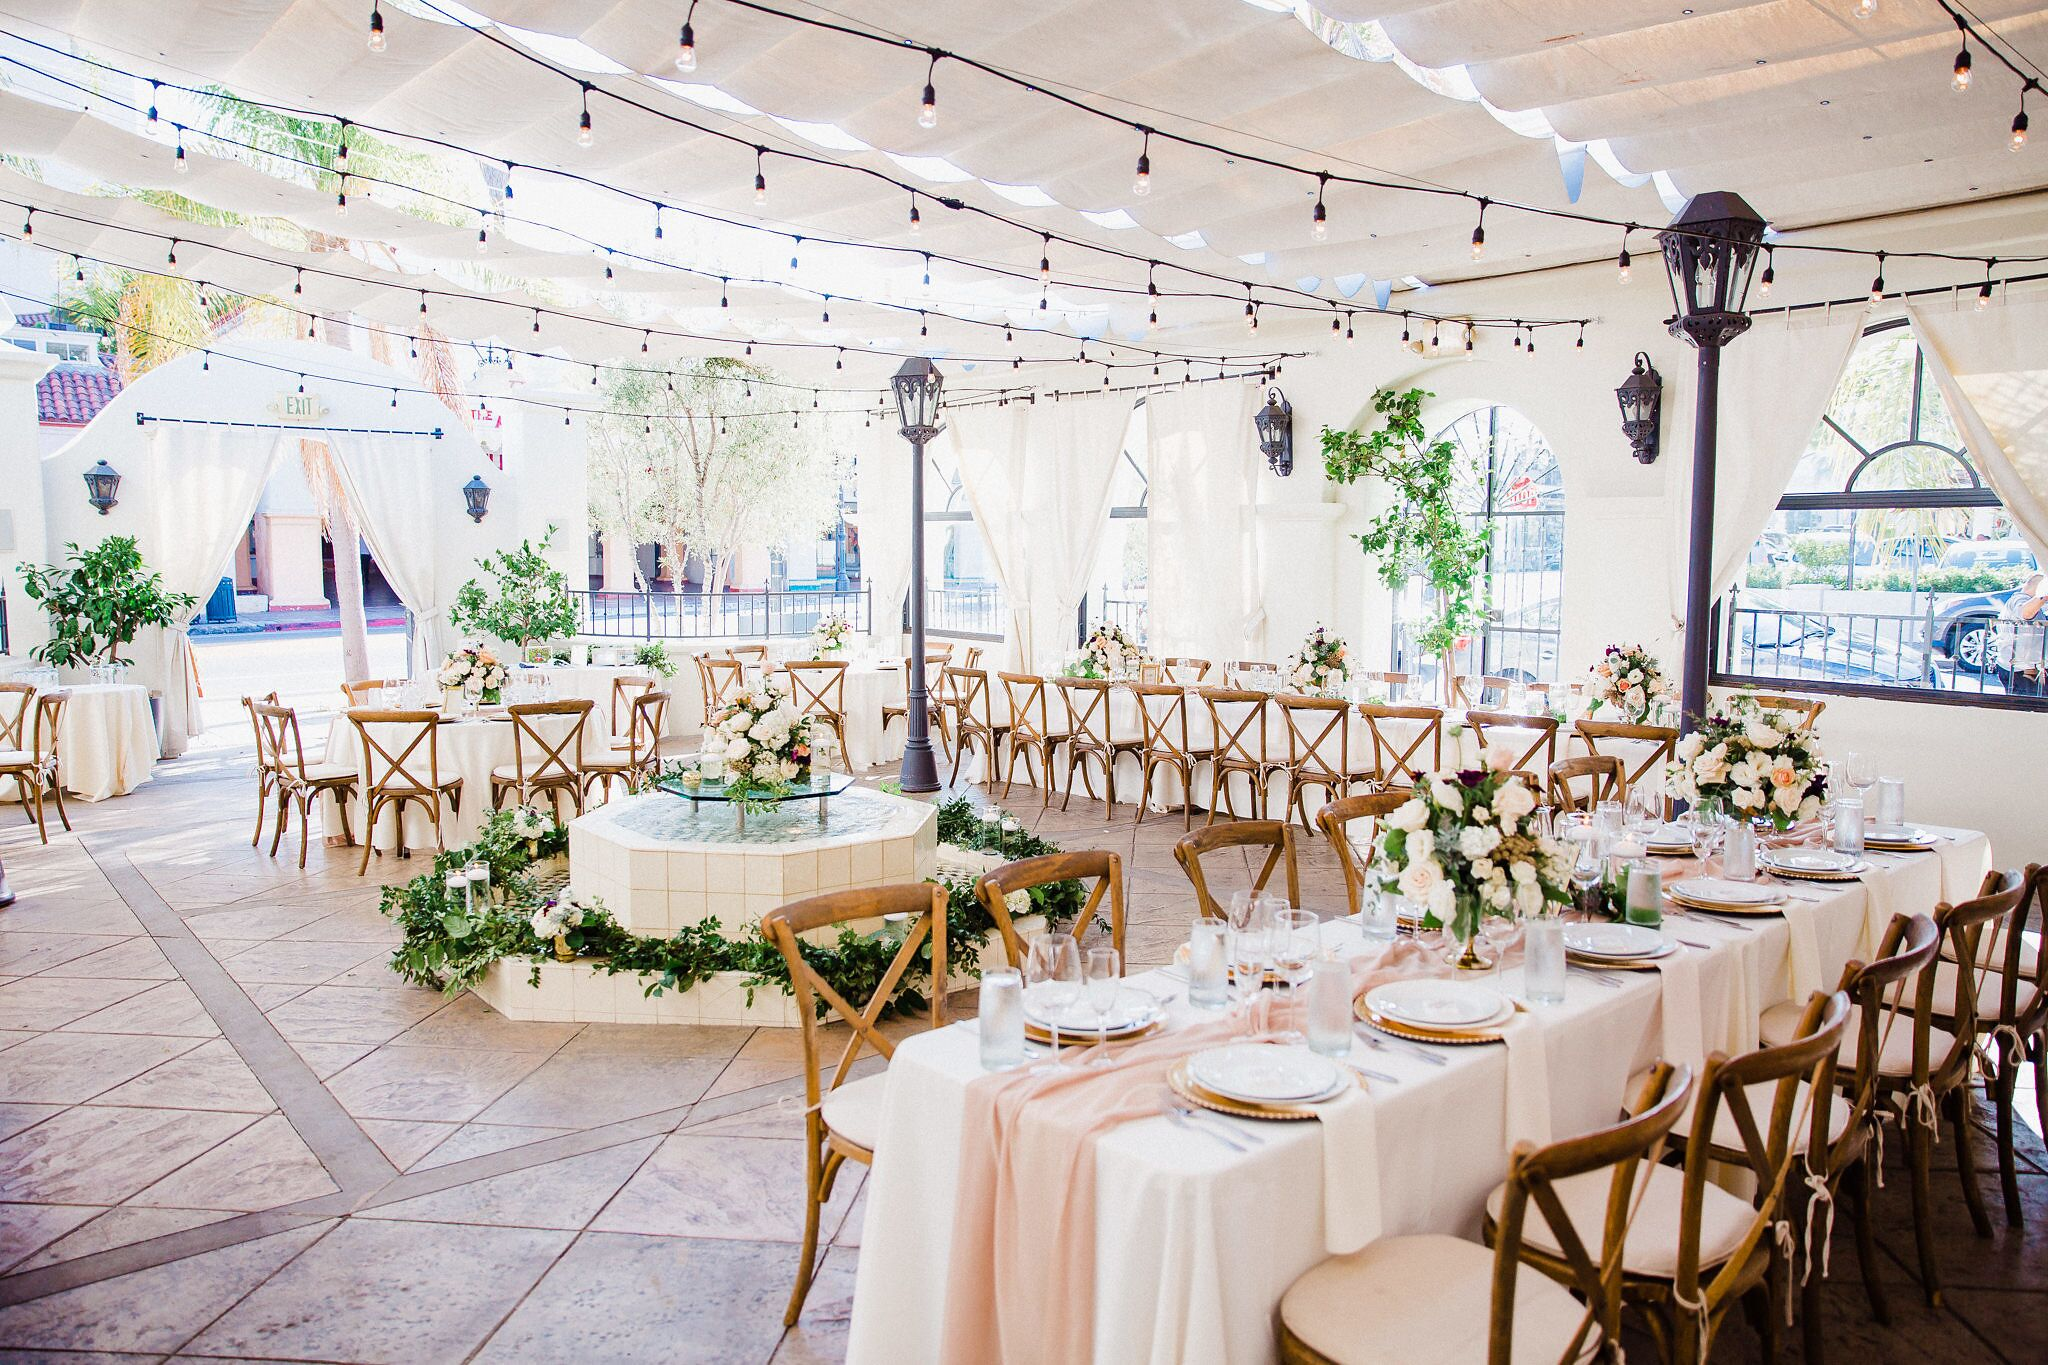 www.santabarbaraweddings.com | Photographer: Grace Kathryn | Venues: Villa & Vine, Santa Barbara Courthouse, Hilton Santa Barbara Resort | Coordination: Burlap & Bordeaux | Reception Site